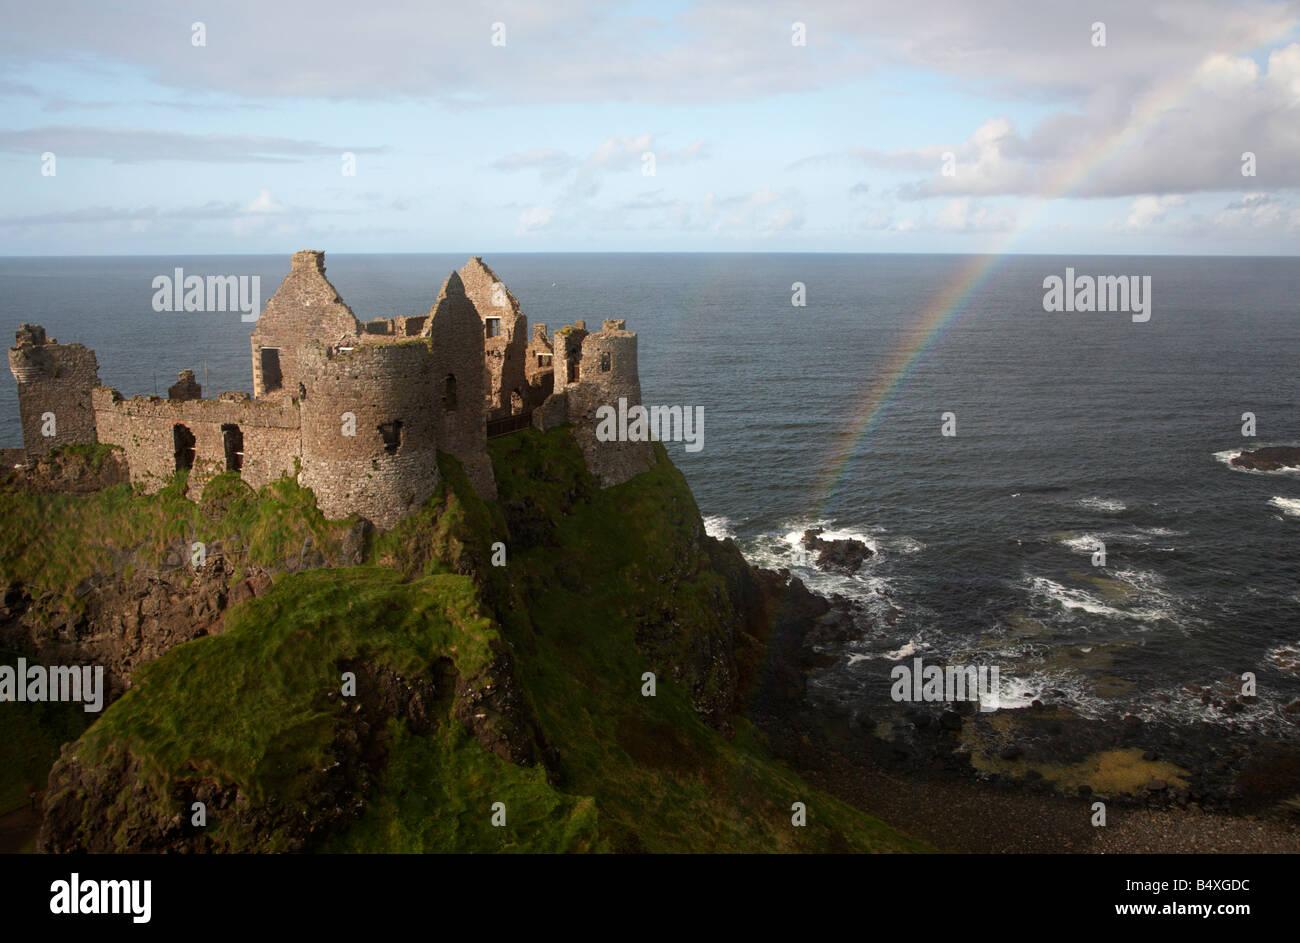 dunluce castle with rainbow and the north antrim coastline county antrim northern ireland uk Stock Photo